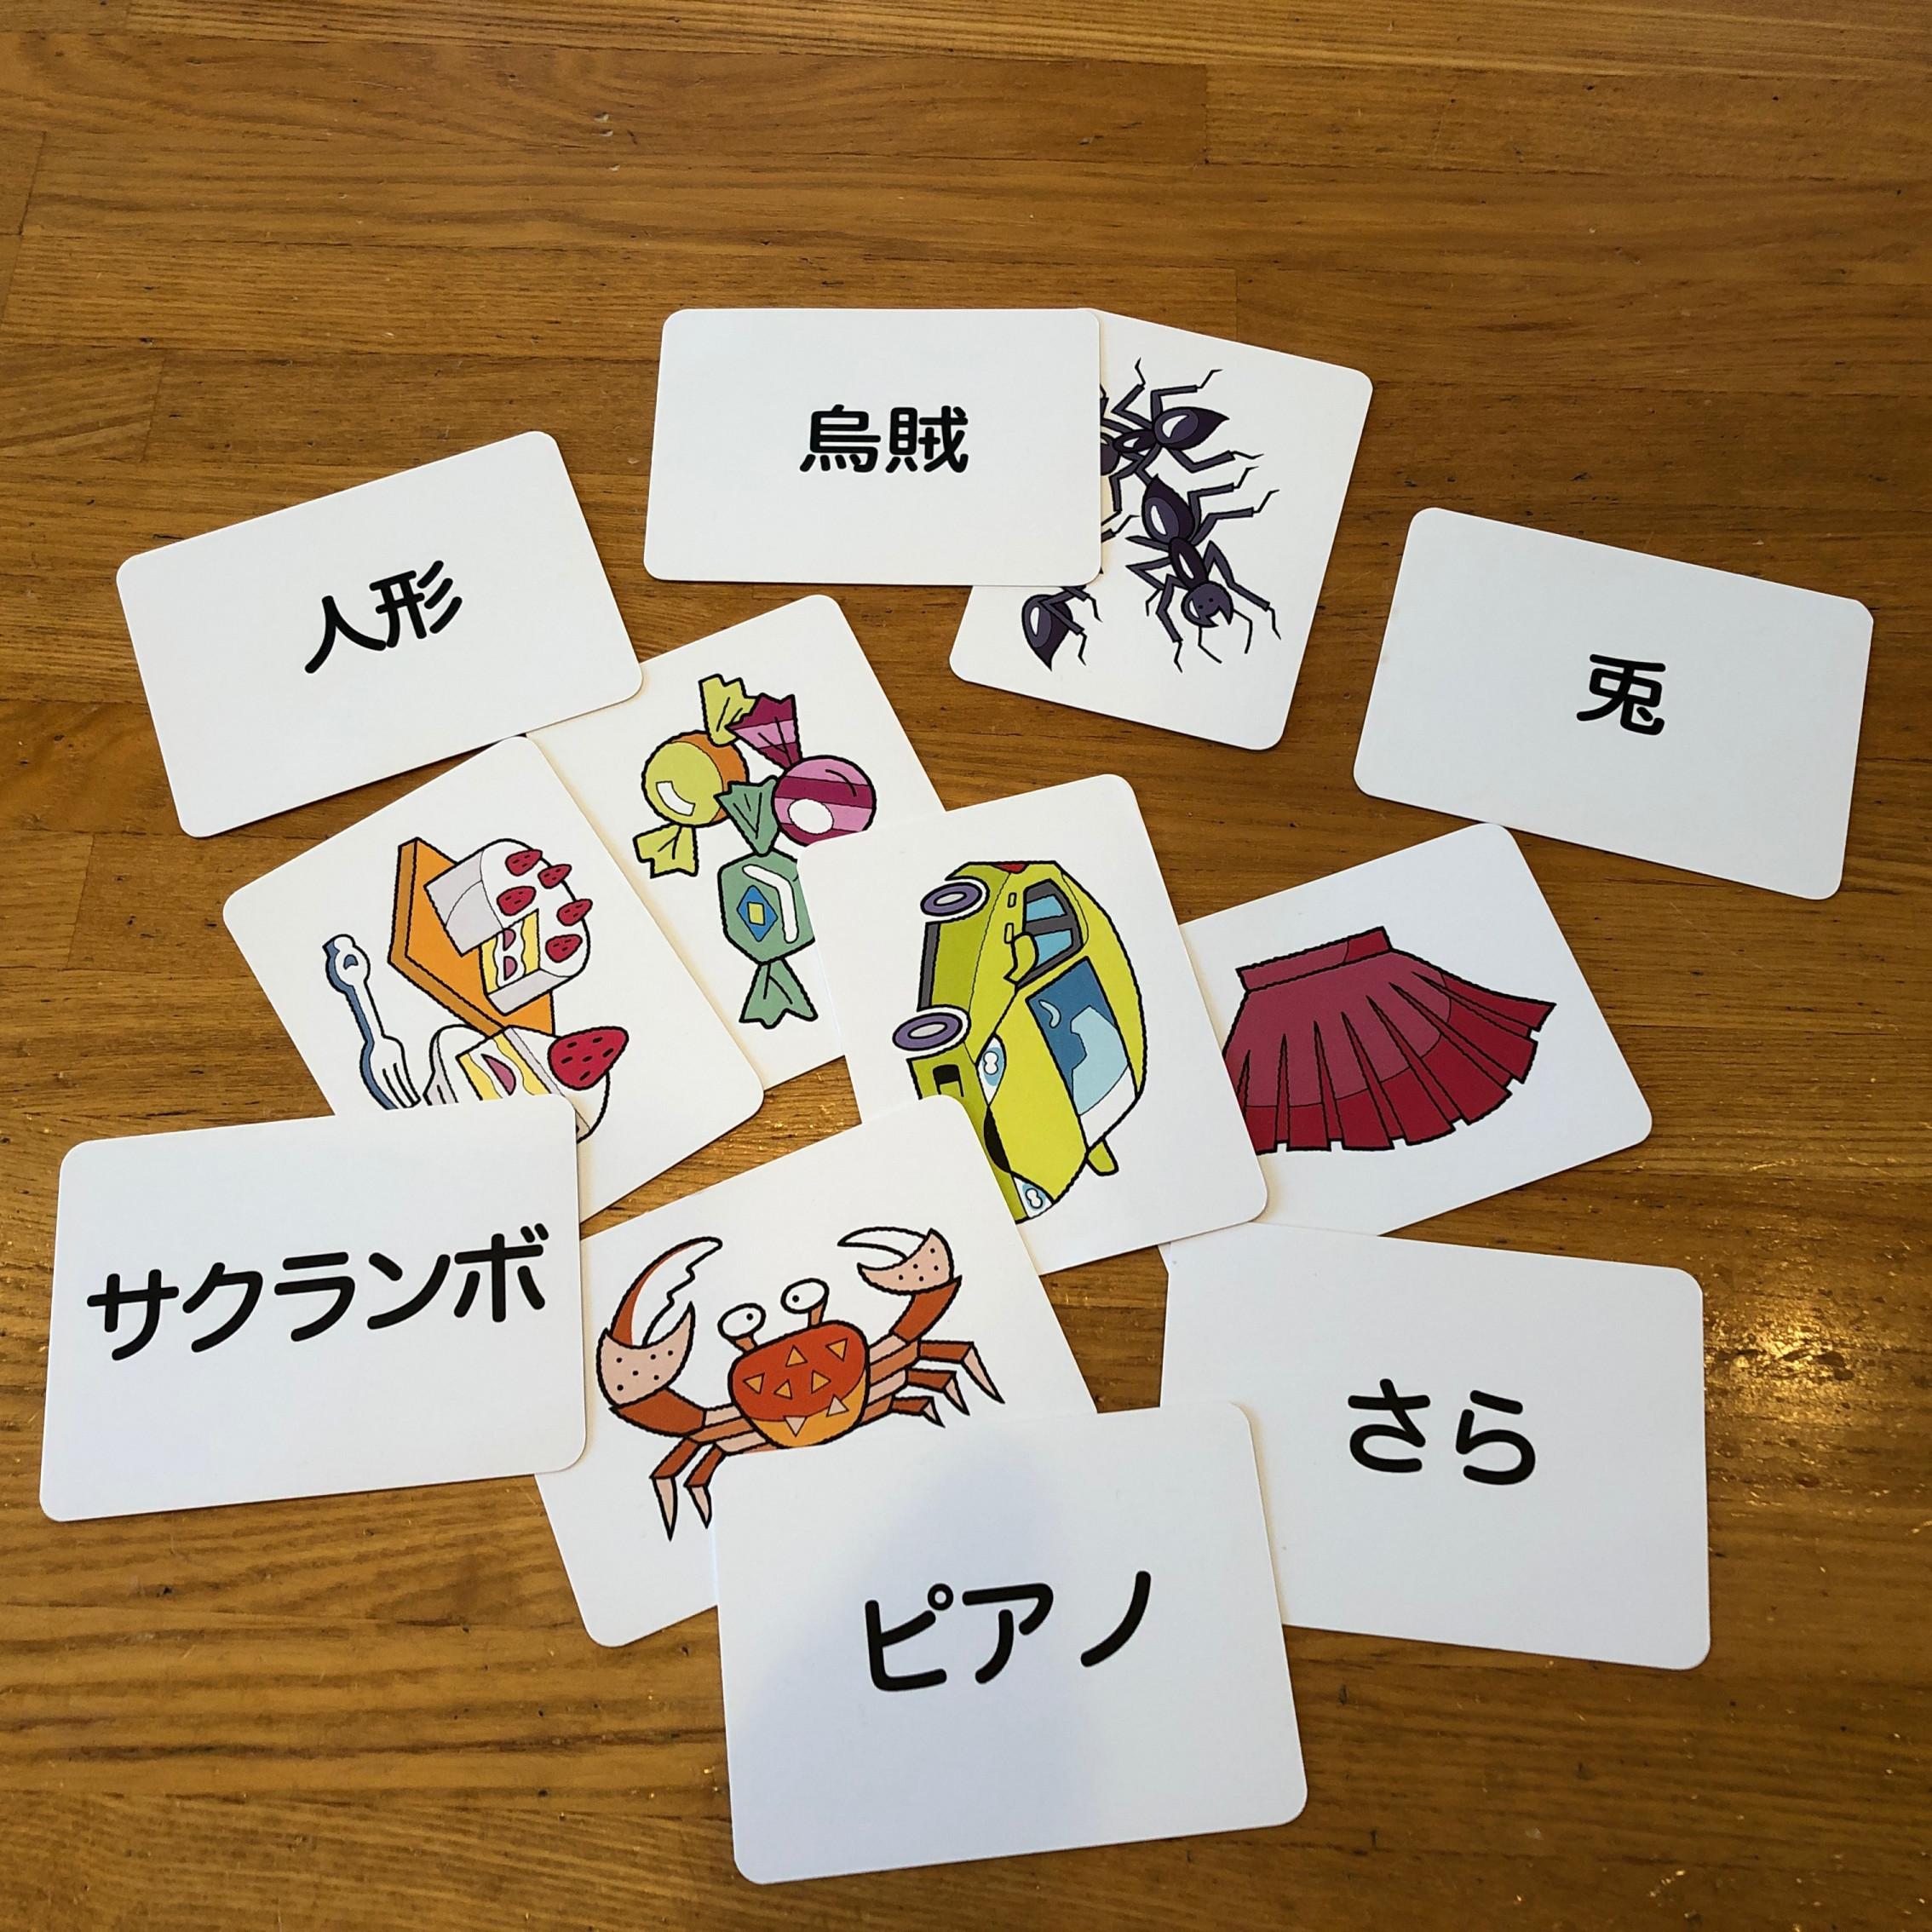 NINJYA BOX用印刷済み100枚お試しカード